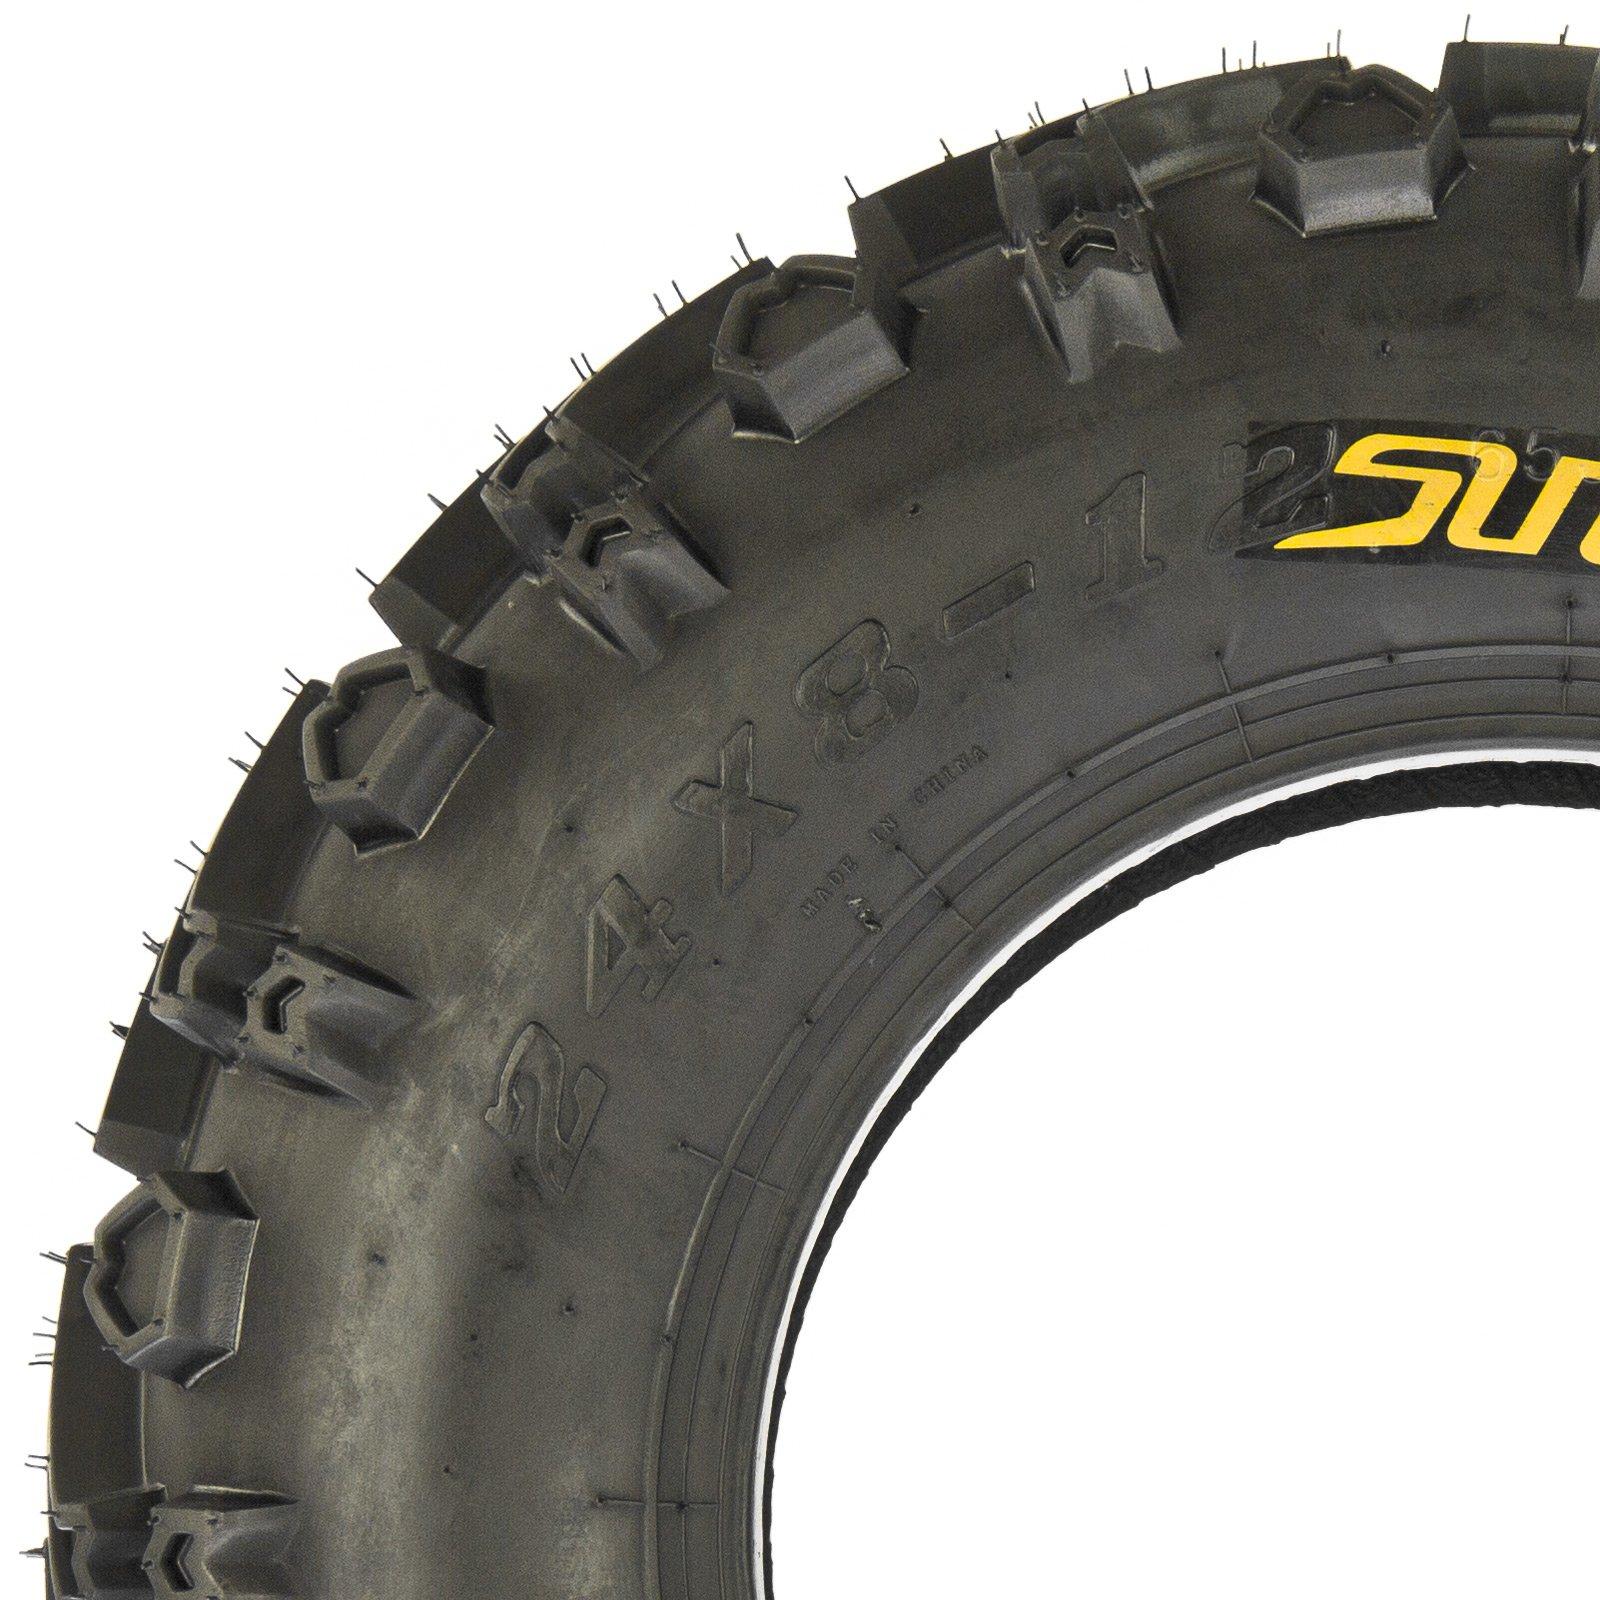 SunF All Trail & Mud ATV UTV Tires 24x8-12 24x10-11 6 PR A041 (Complete Full Set of 4) by SunF (Image #4)